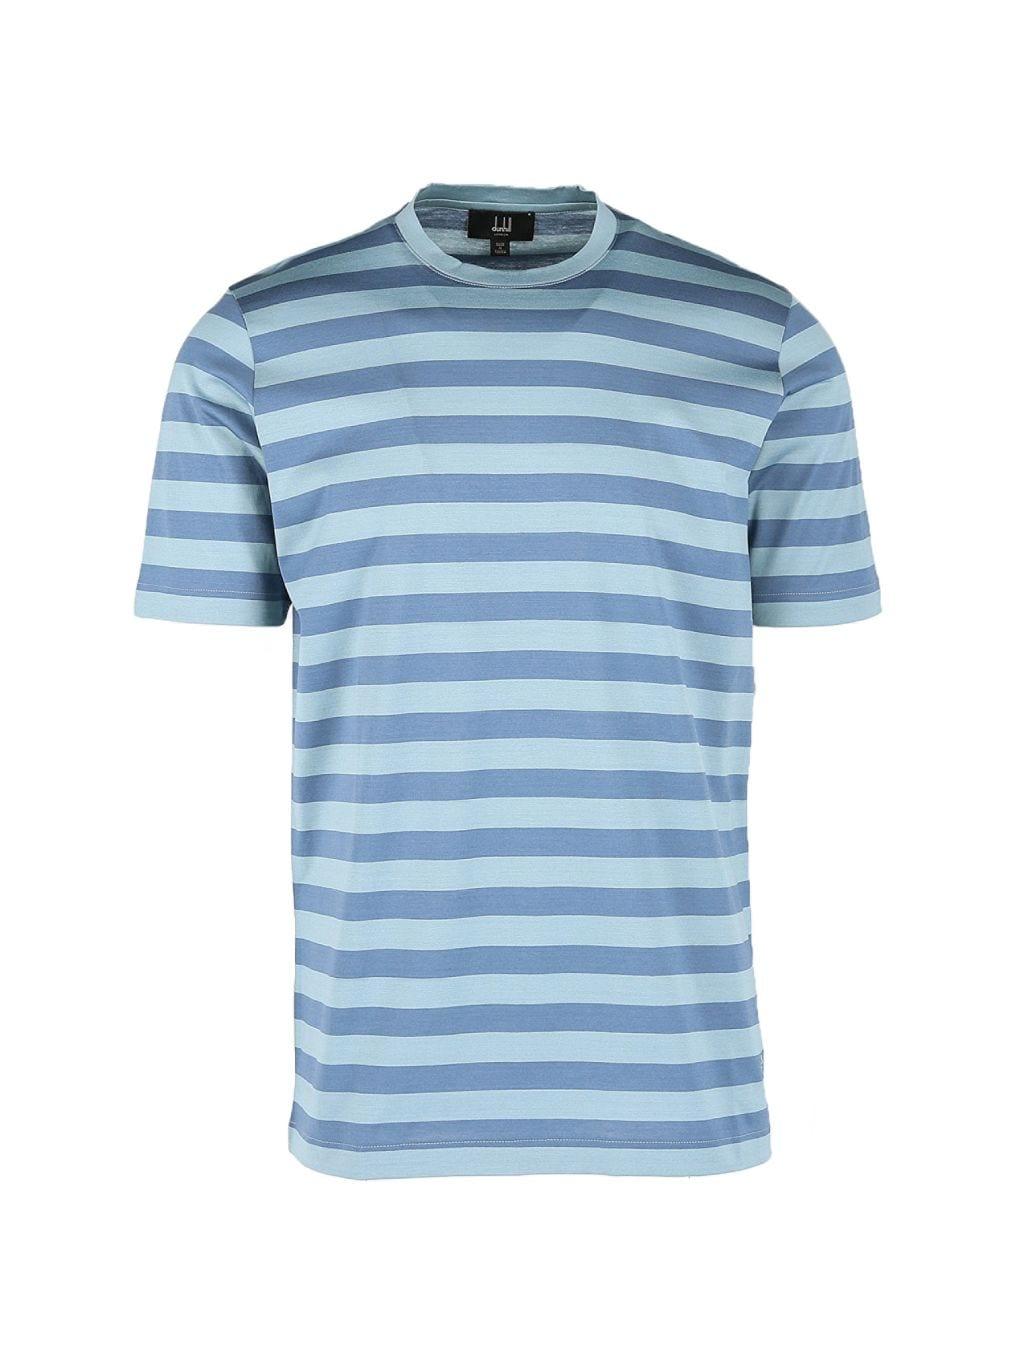 Dunhill Striped Cotton T-Shirt